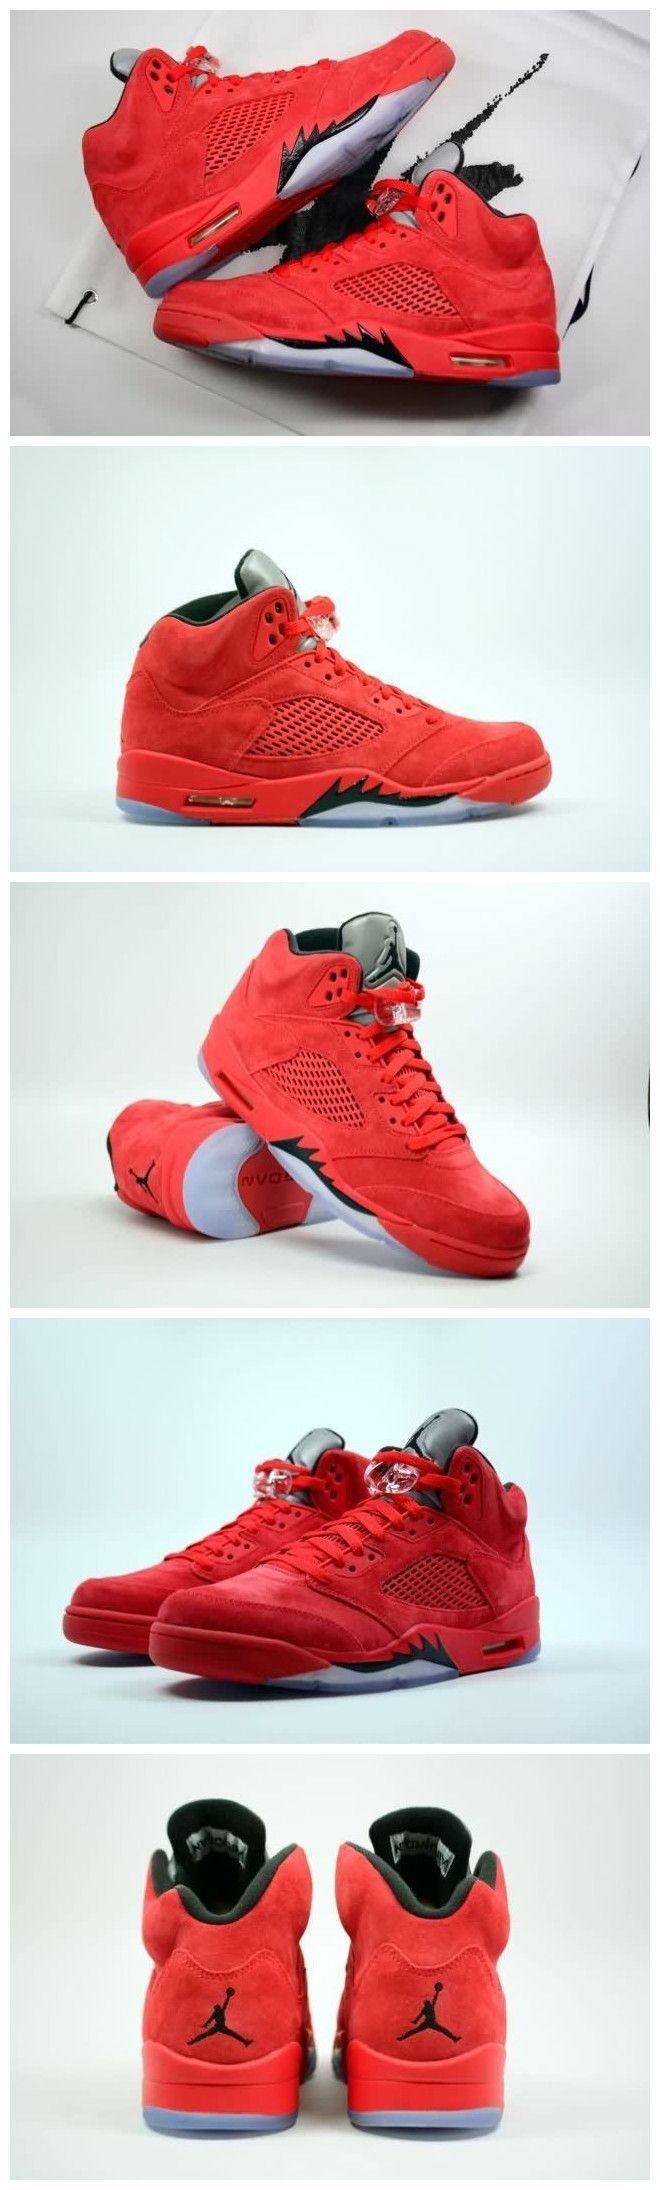 Air Jordan 5 AAAA Suede Men Shoes Free Shipping WhatsApp86 13328373859 Wechate2shoes